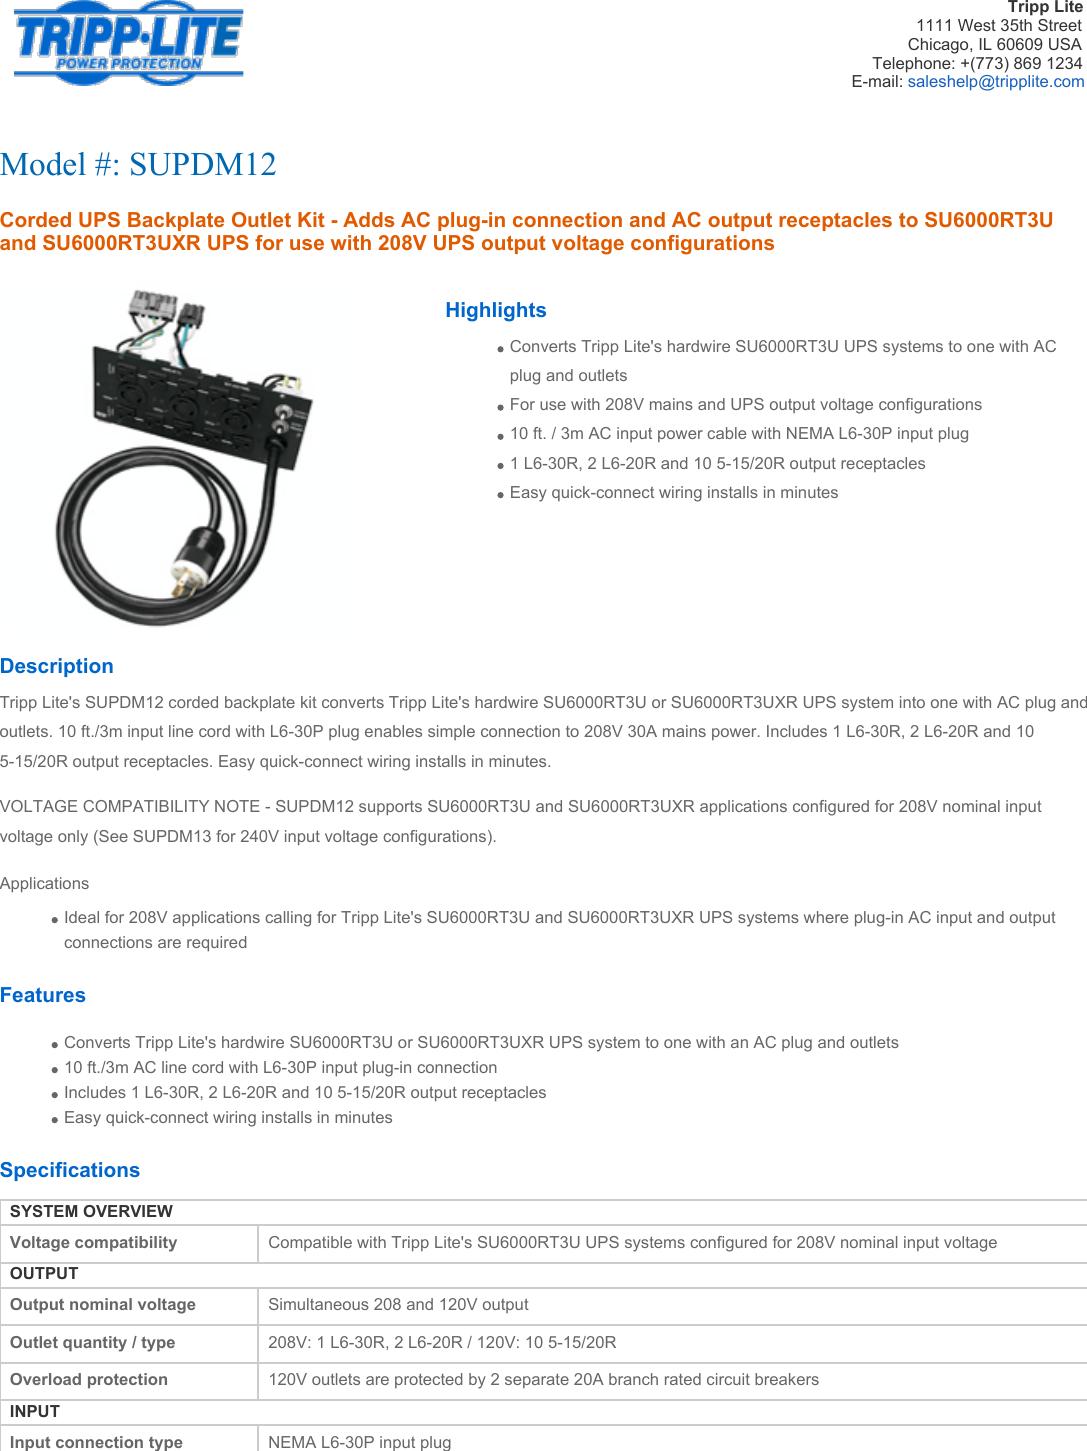 Conntek Tel1430 Nema L14 Manual Guide